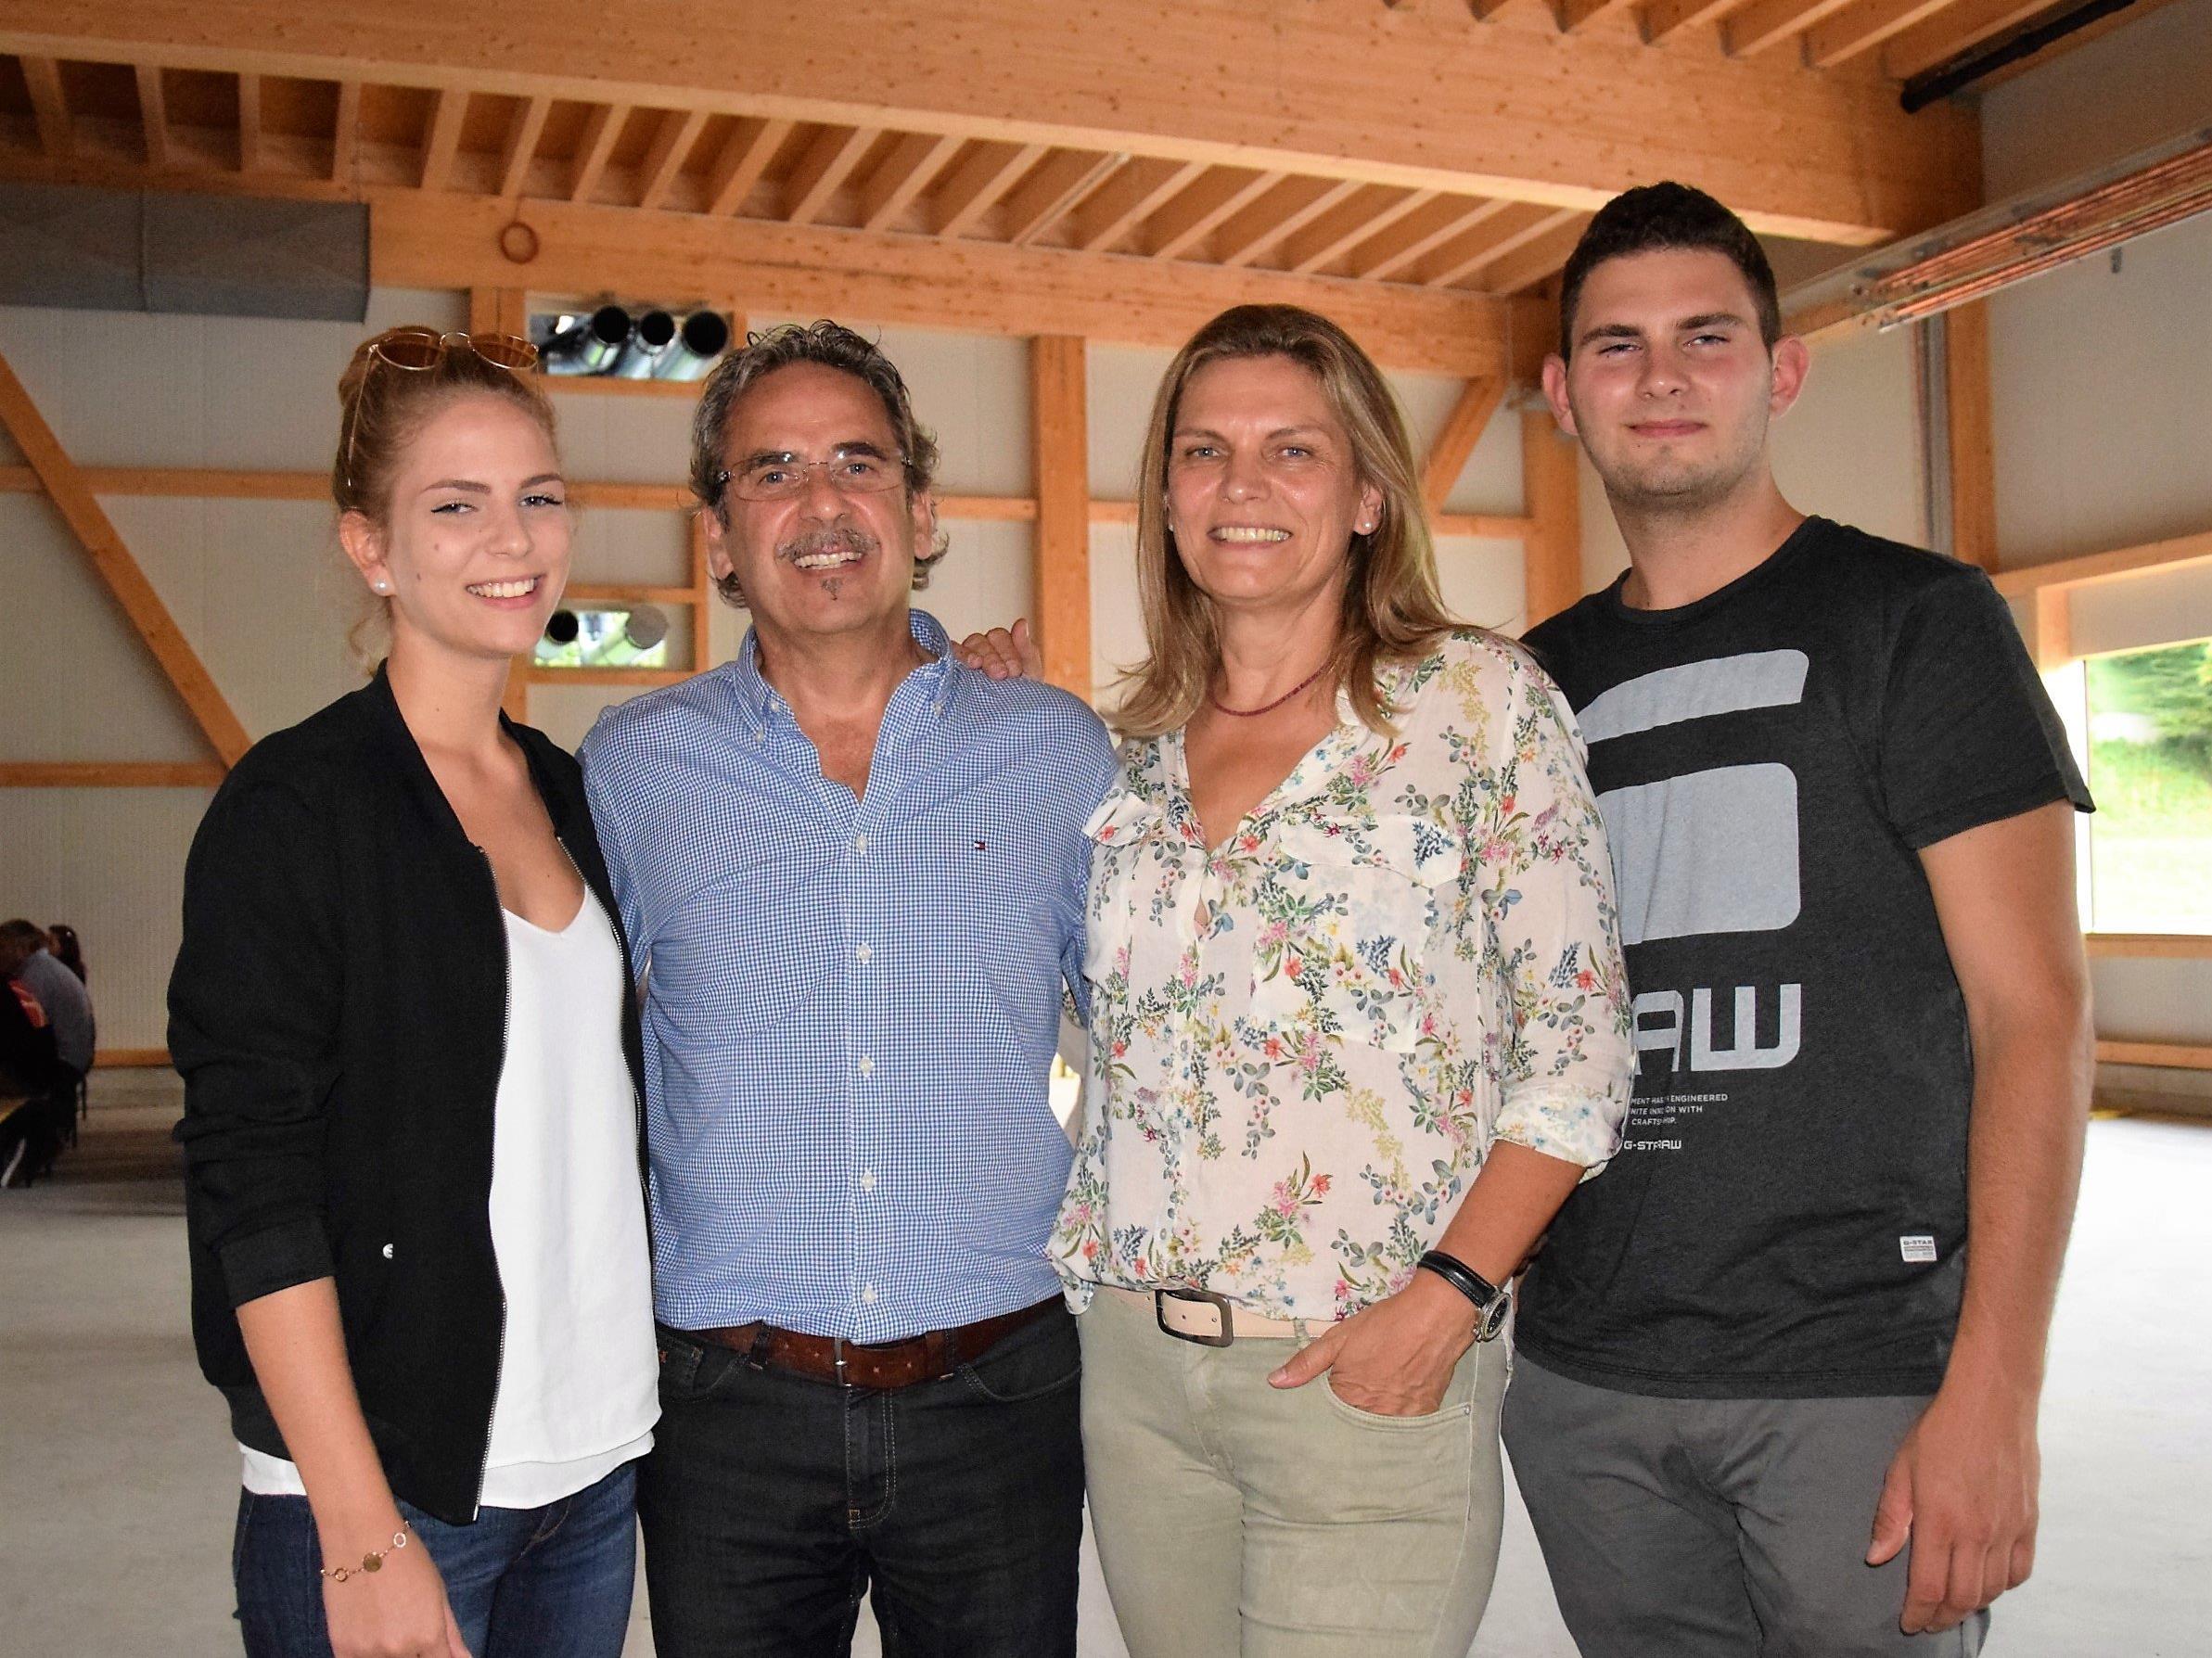 Familie Längle freut sich auf die neue Werkstatt am Hopbach: v.l.n.r. Katharina, Armin, Gabi & Michael Längle